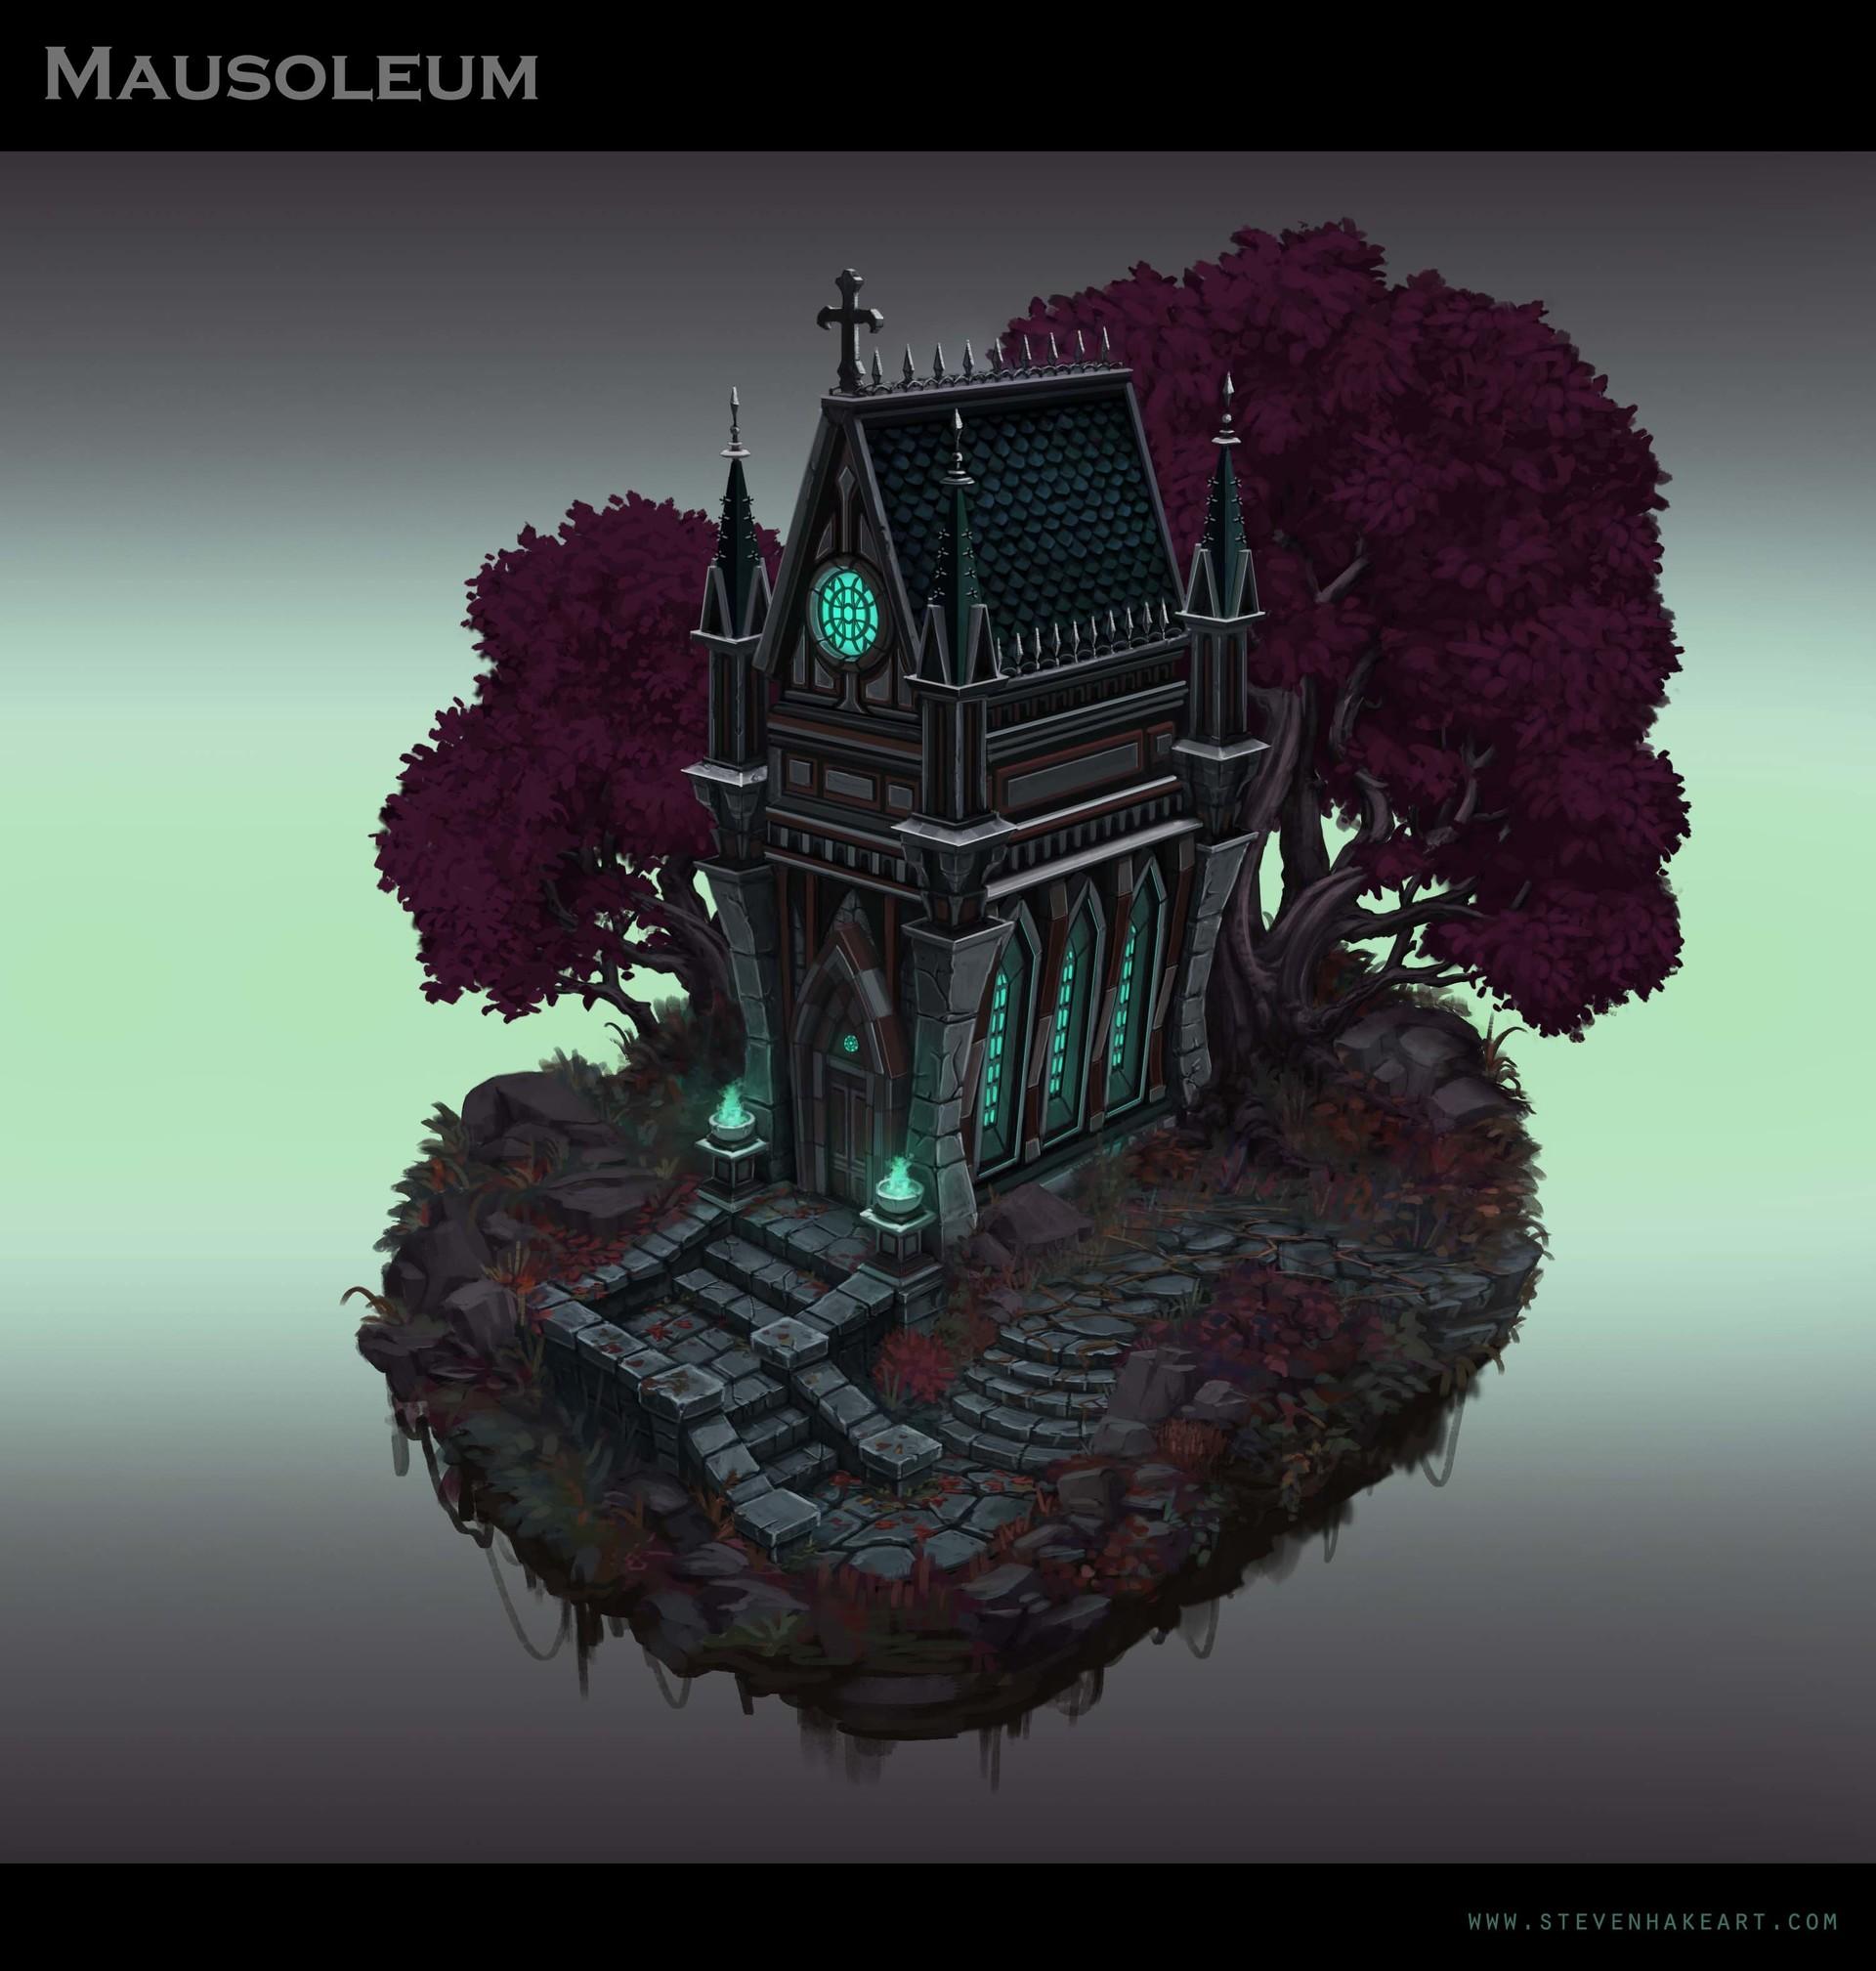 Steven hake mausoleum